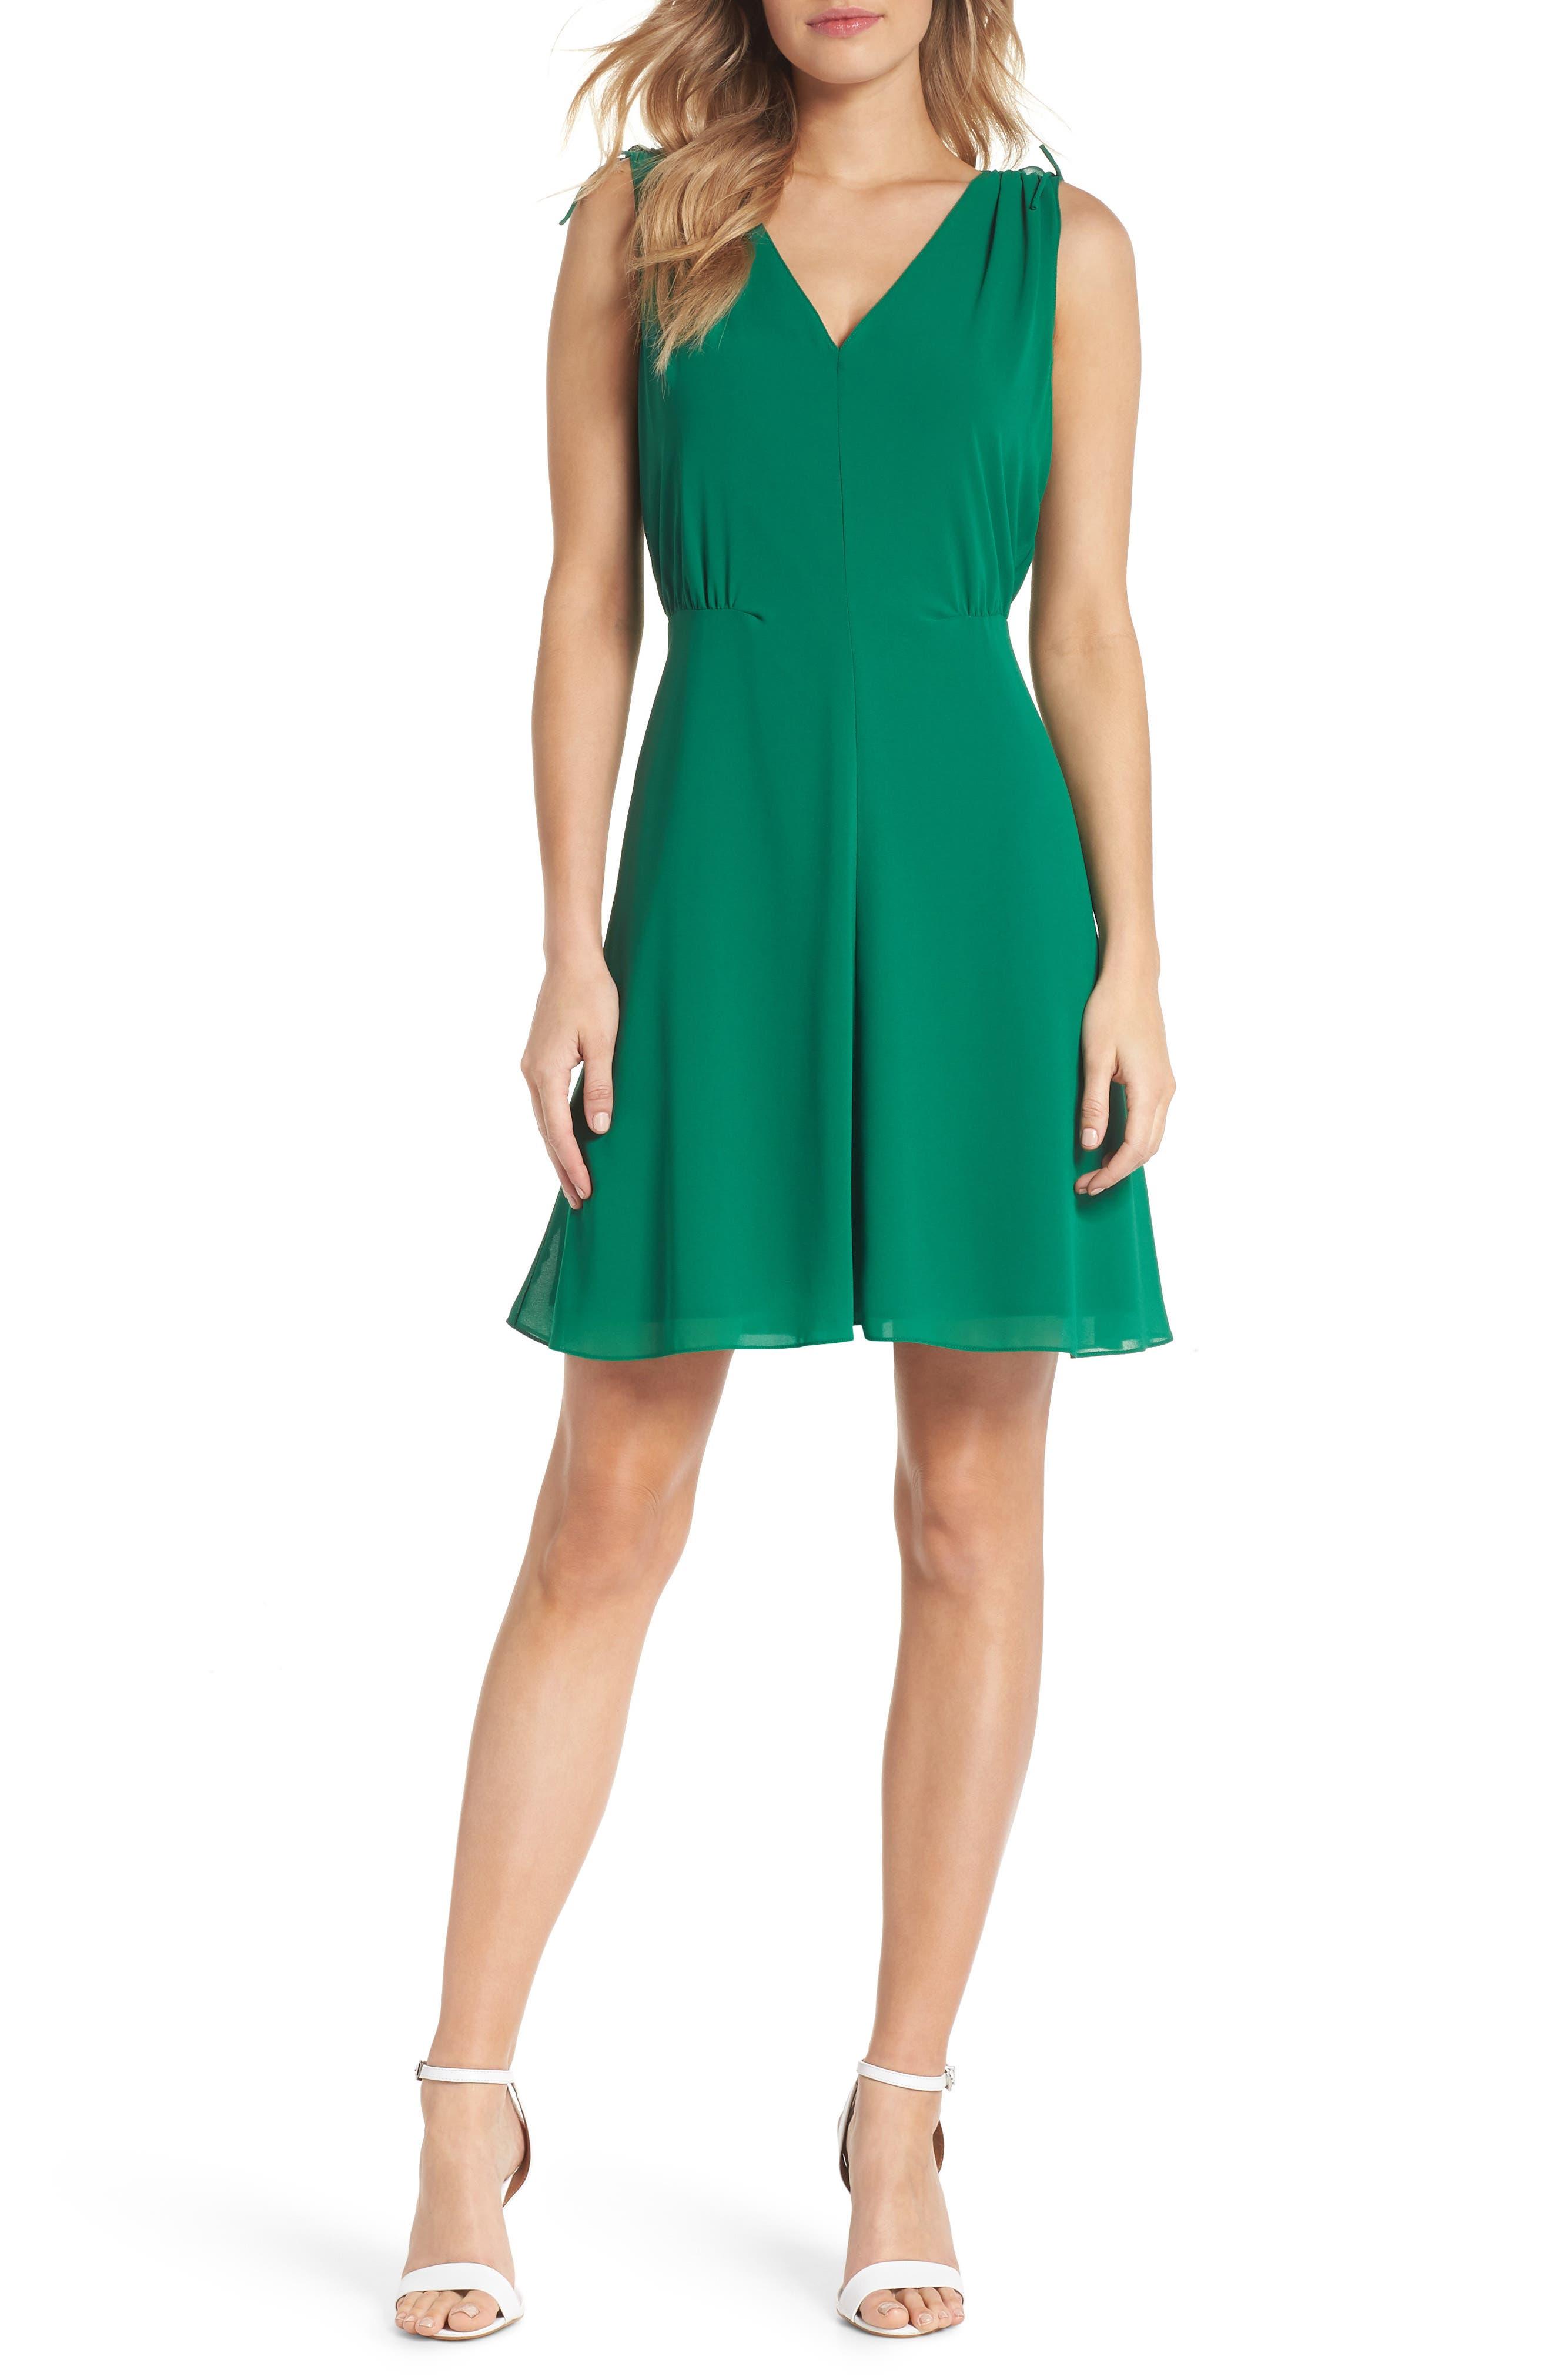 Soufflé V-Neck Chiffon Dress,                             Main thumbnail 1, color,                             310